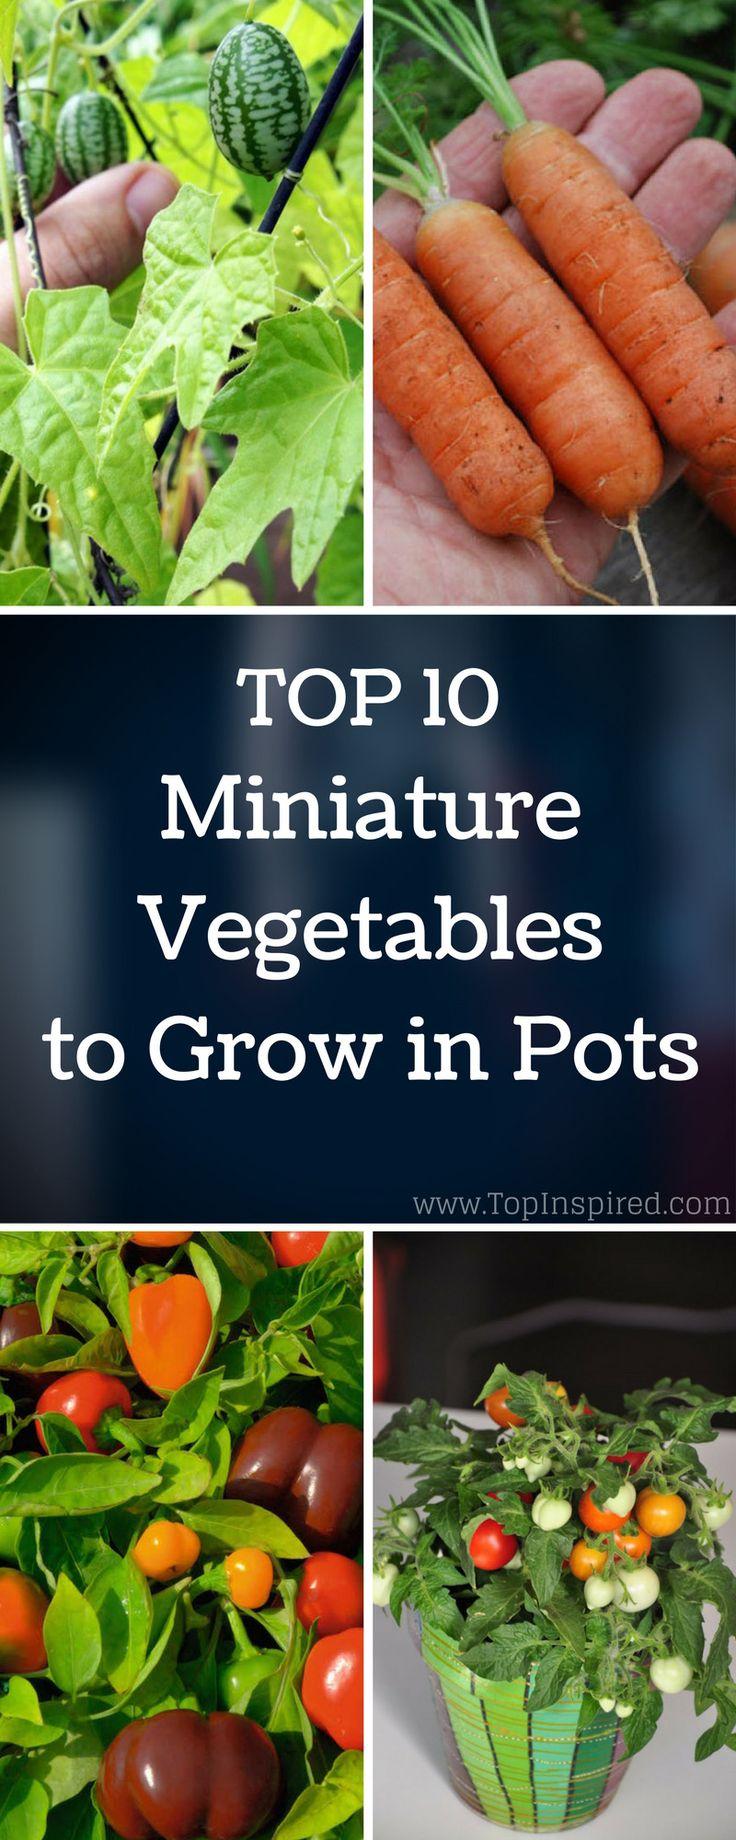 Top 10 Miniature Vegetables To Grow In Pots Growing 400 x 300